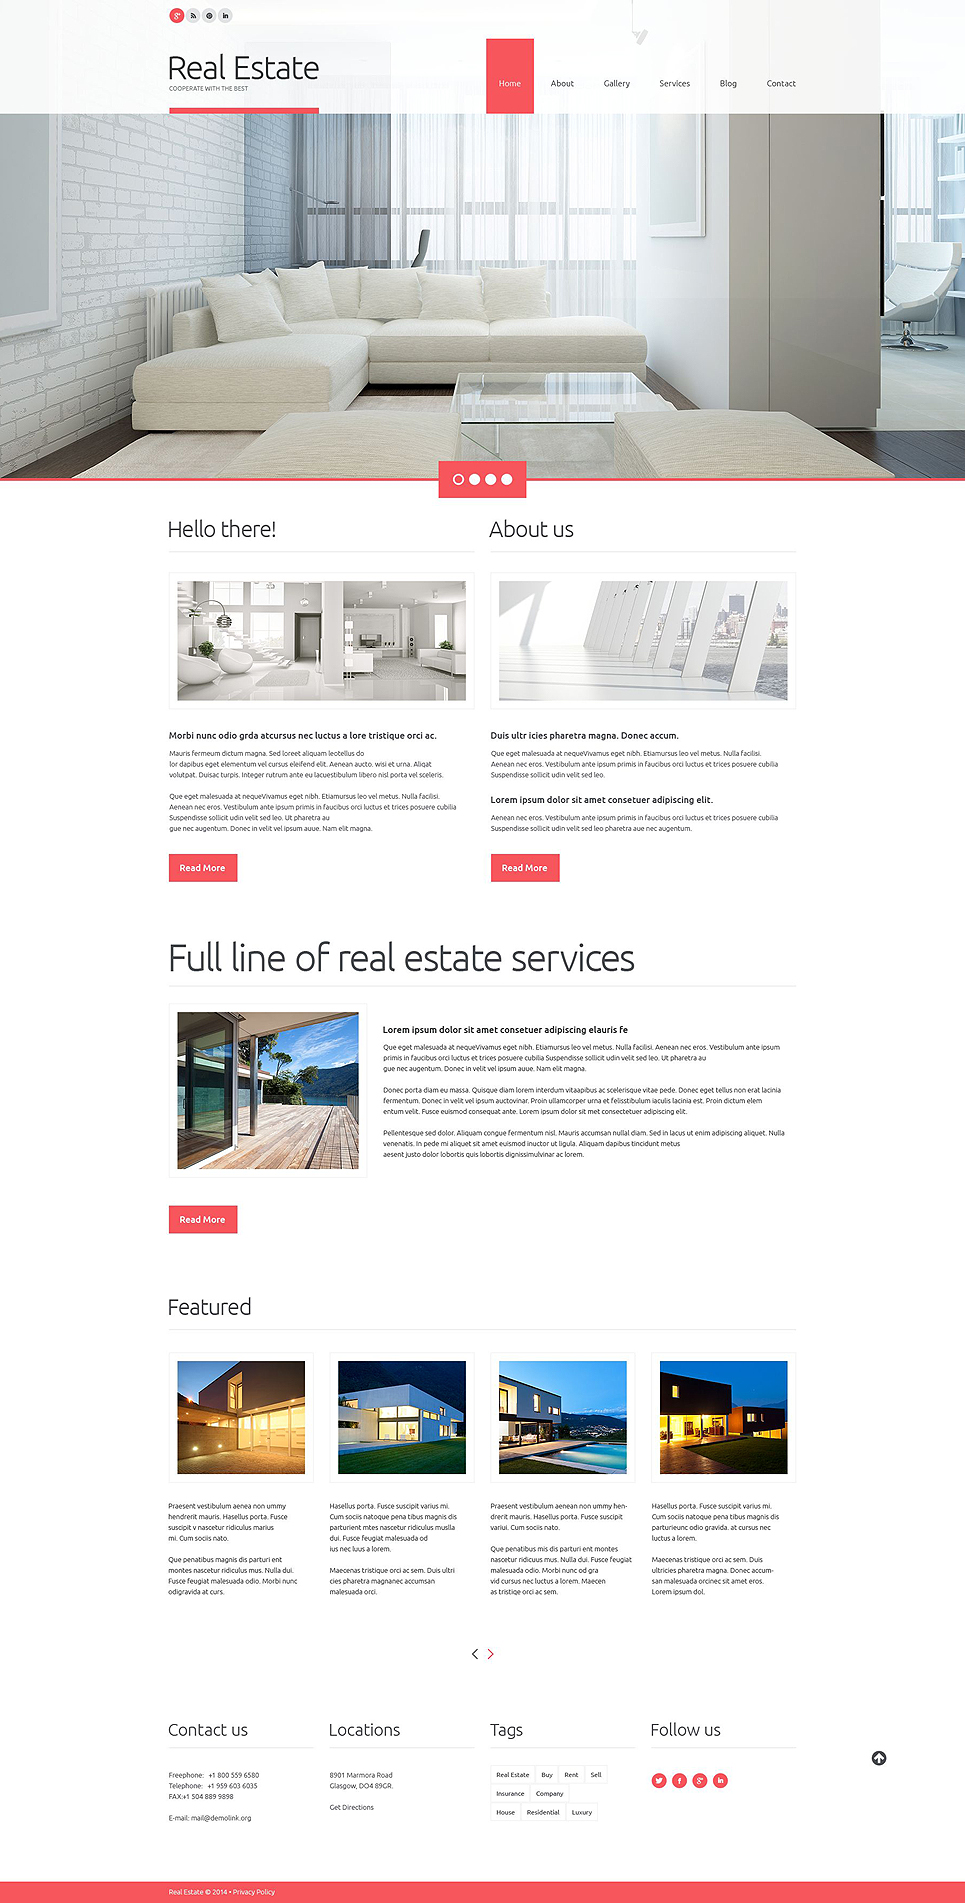 Адаптивный шаблон сайта на тему агентство недвижимости #52174